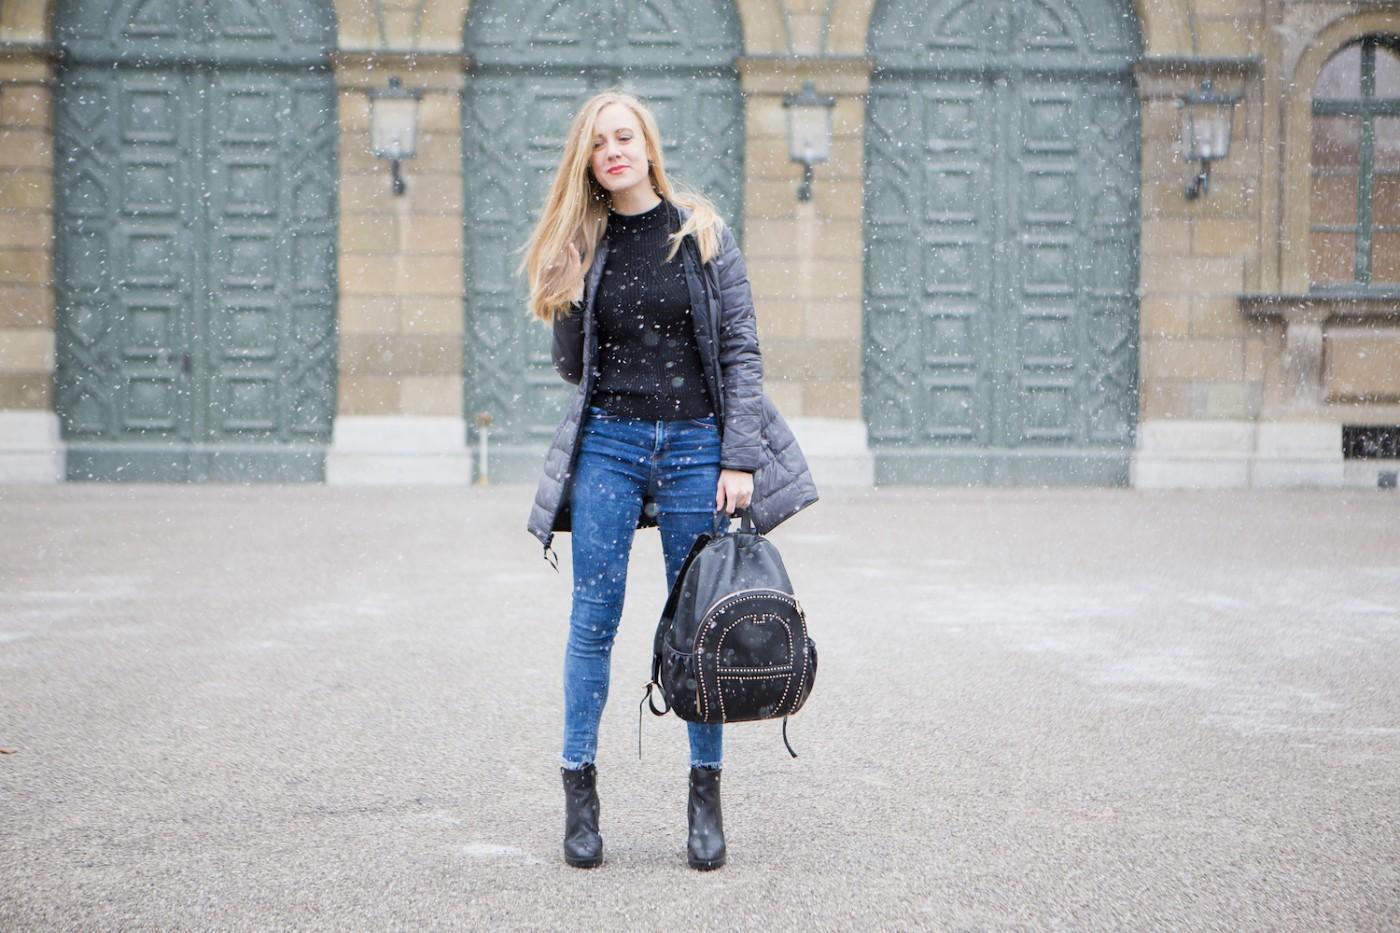 #useyourand, The Golden Bun | München Modeblog, German Fashion Blog, Fashionblogger, new trends